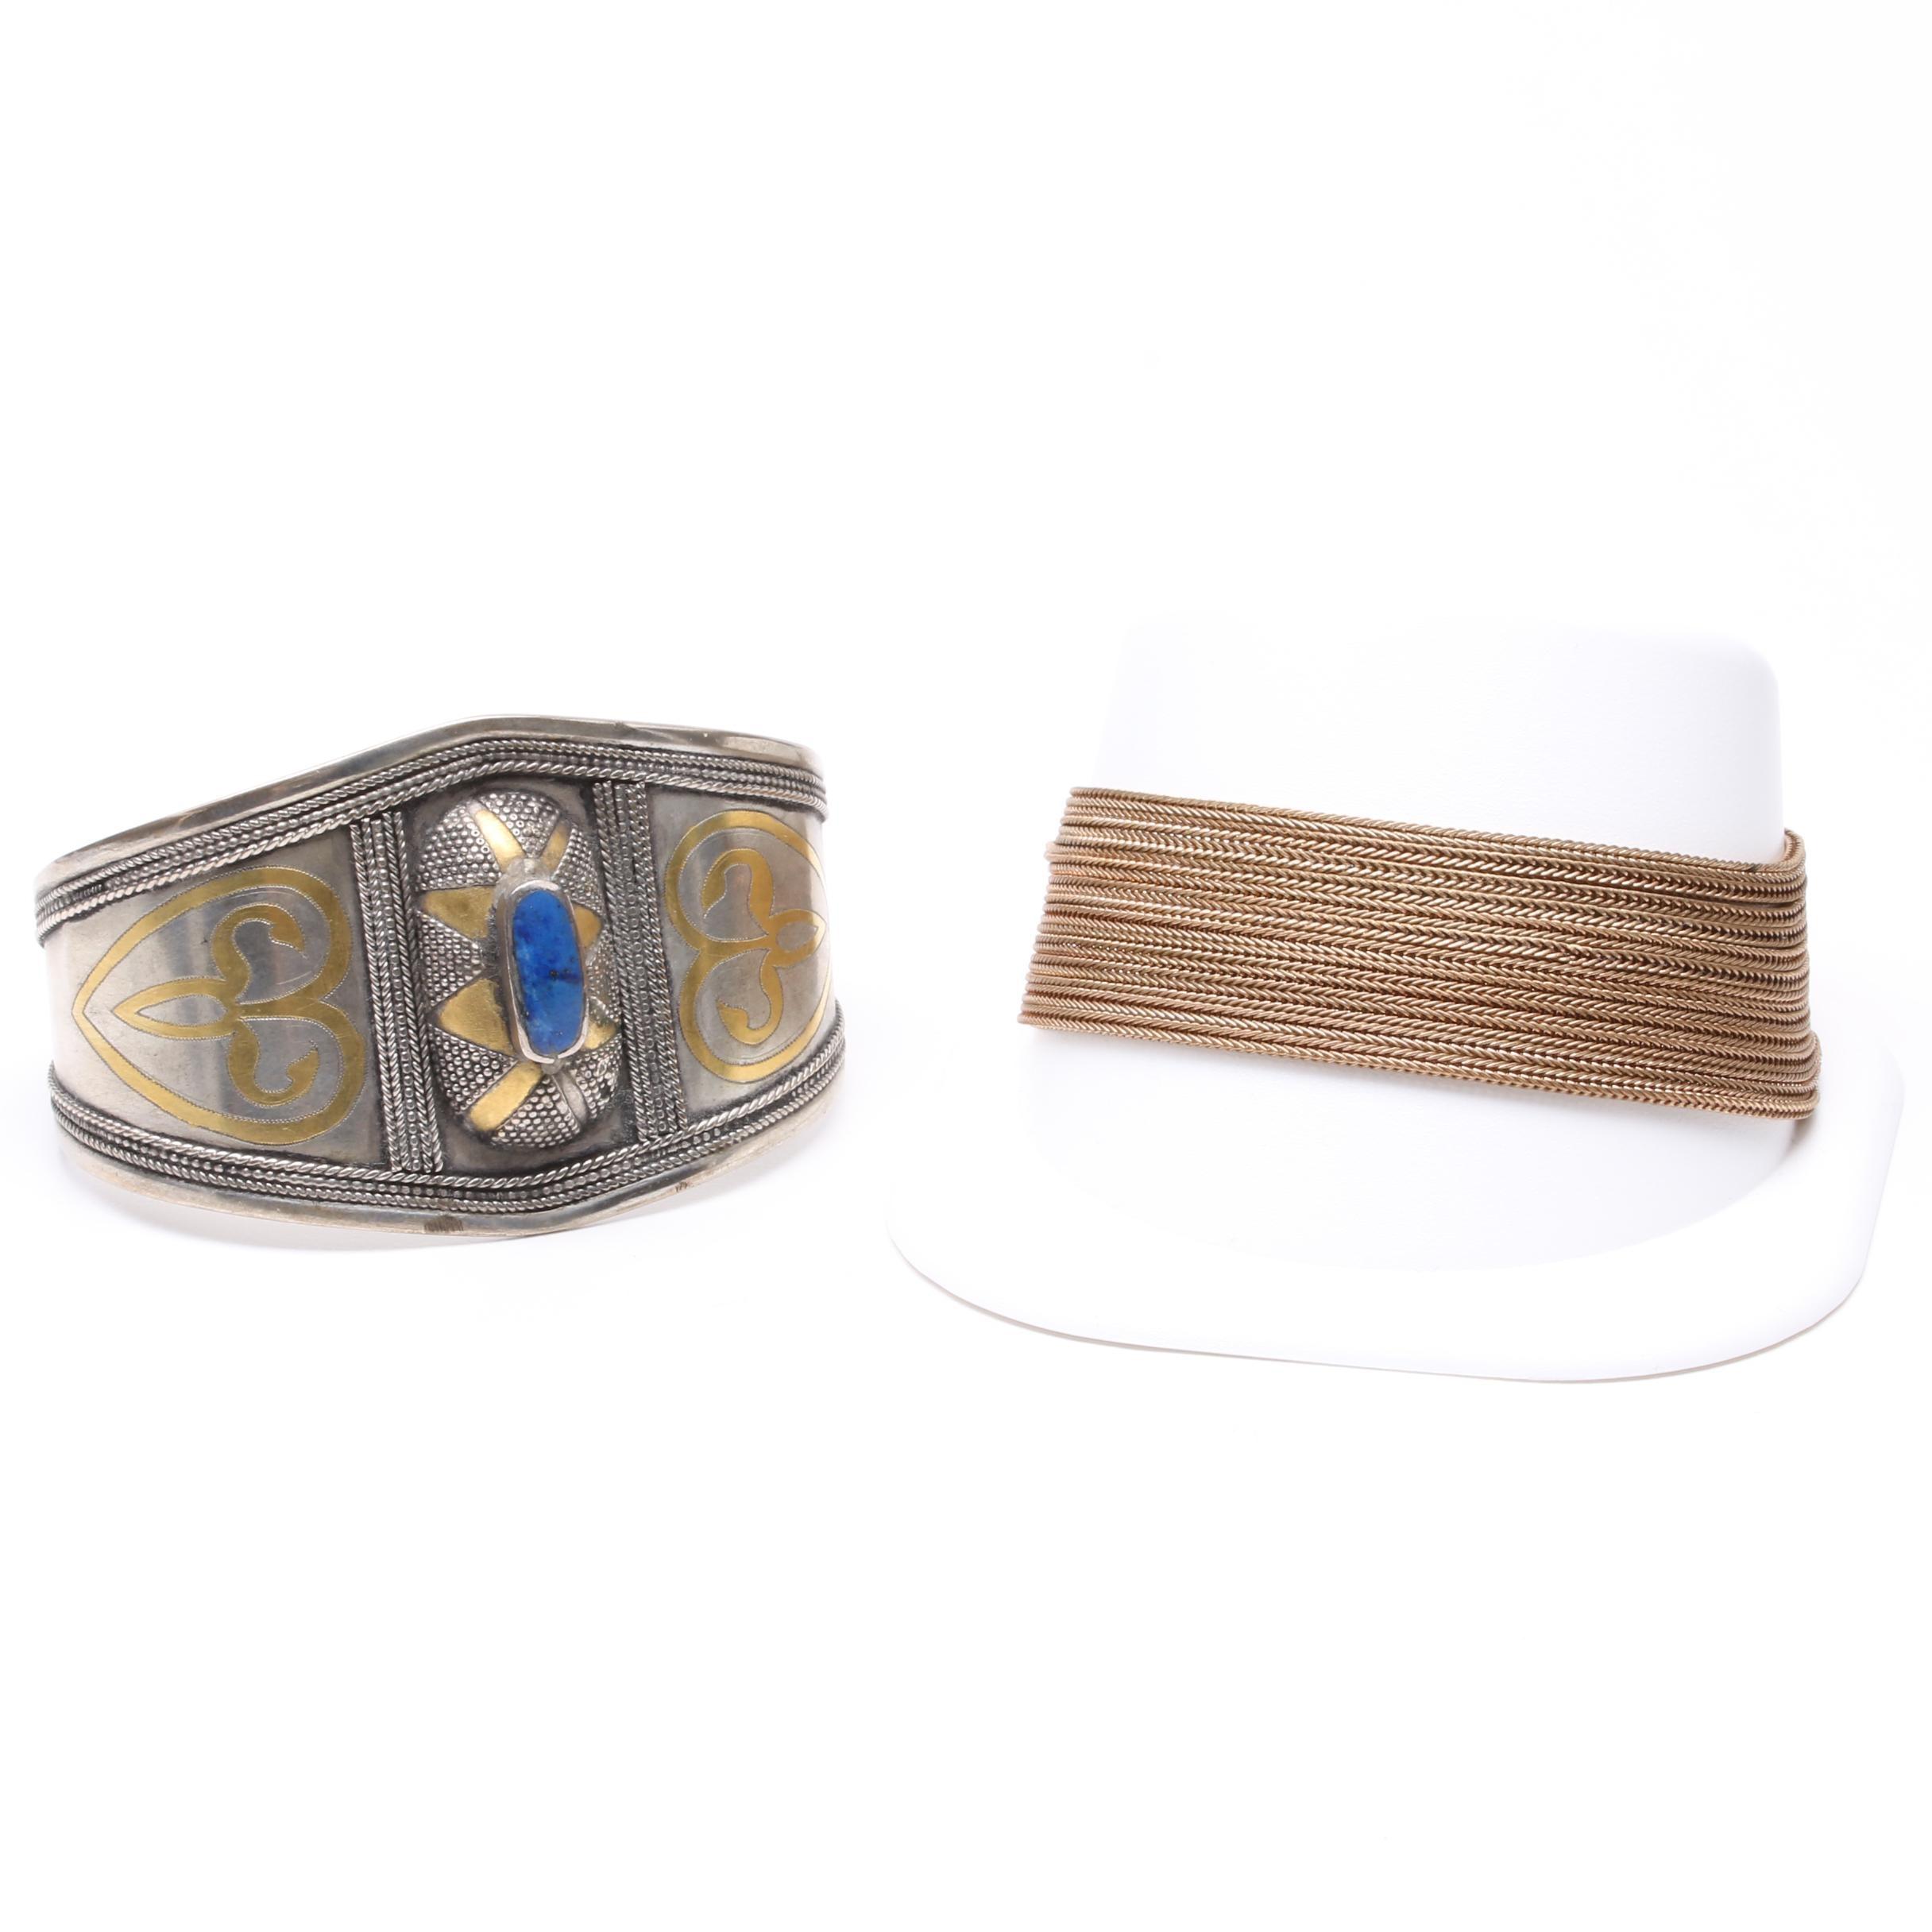 Costume Lapis Lazuli Bracelets Including an Egyptian Revival Style